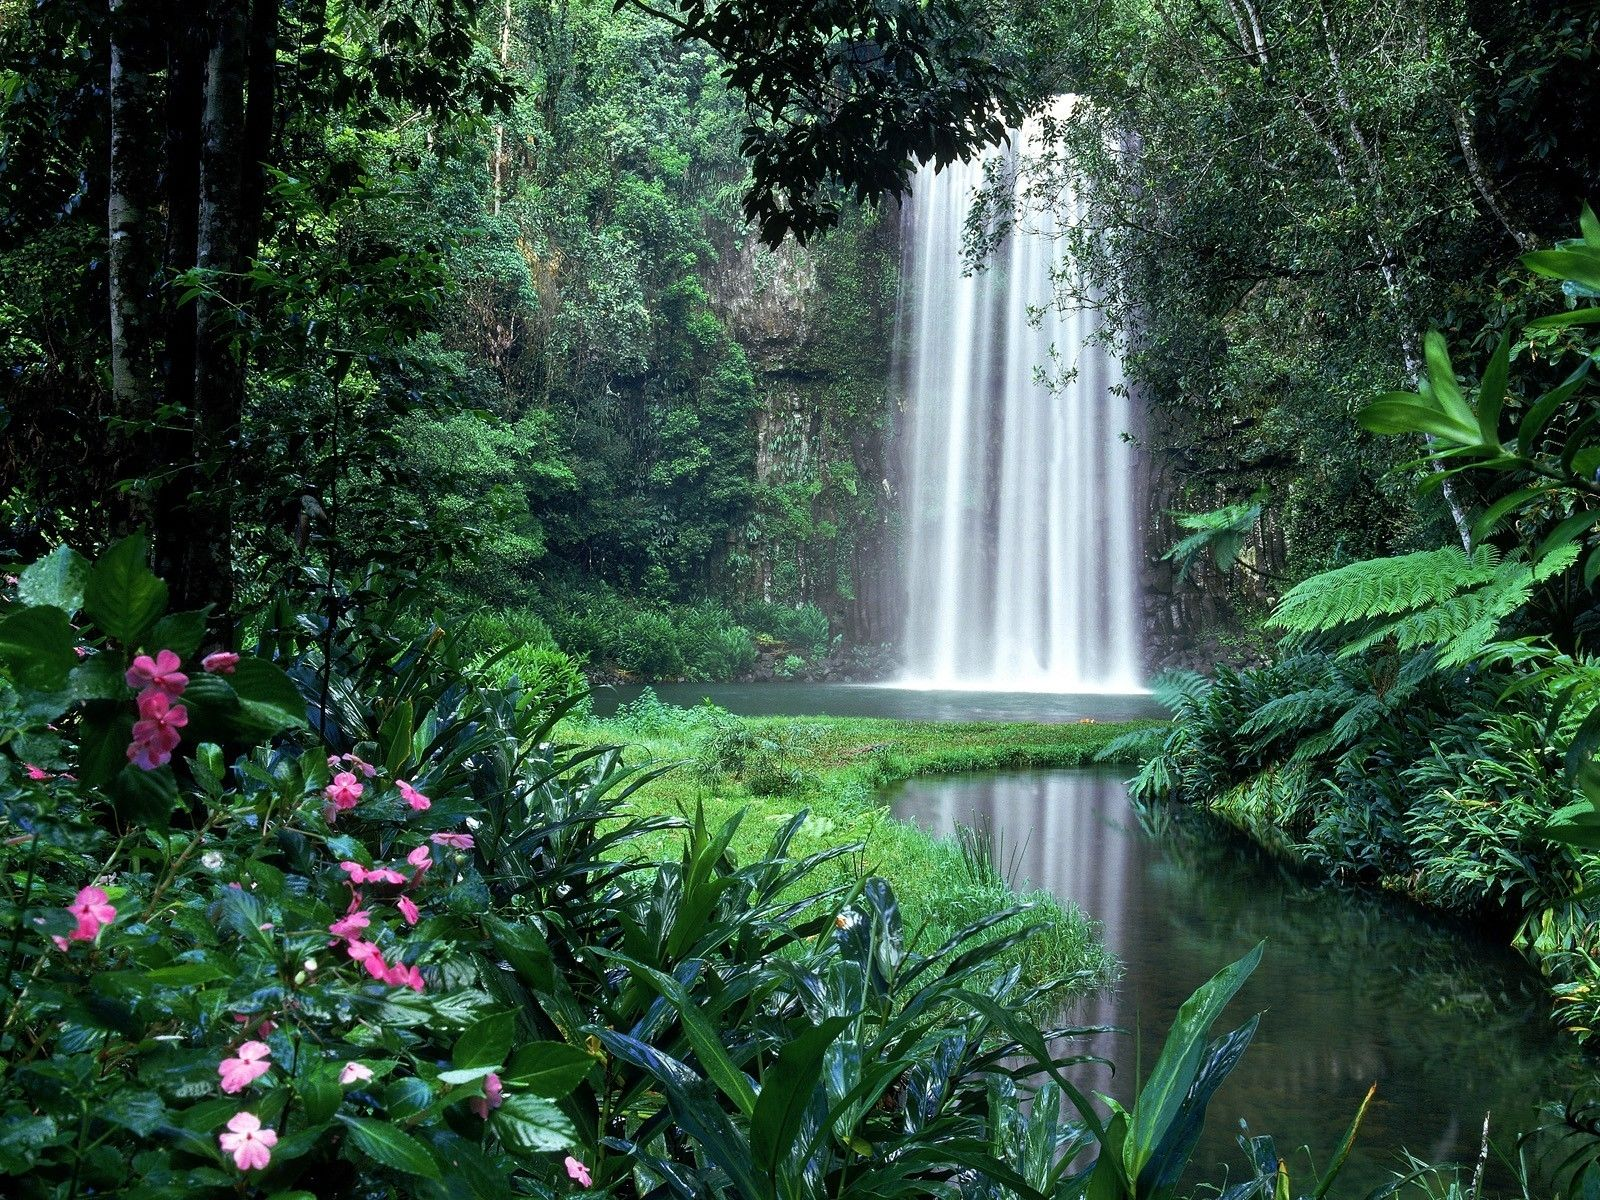 forest flower gardens landscapes garden rivers trees